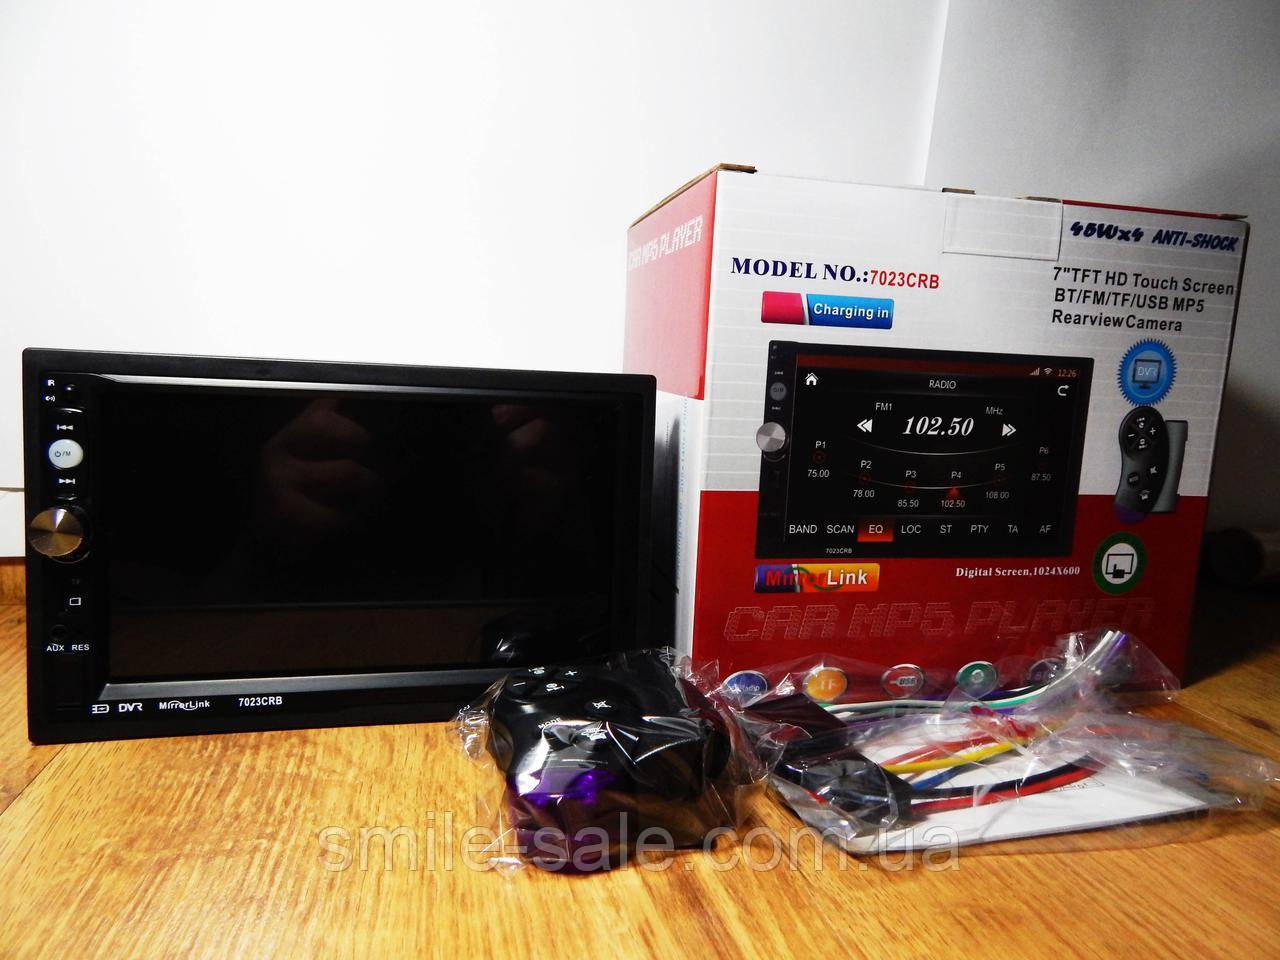 "Автомагнитола 2Din Pioneer 7023CRB 7"" Экран, Bluetooth, Читает ВИДЕО+ Пульт на руль+Рамка+Шахта"